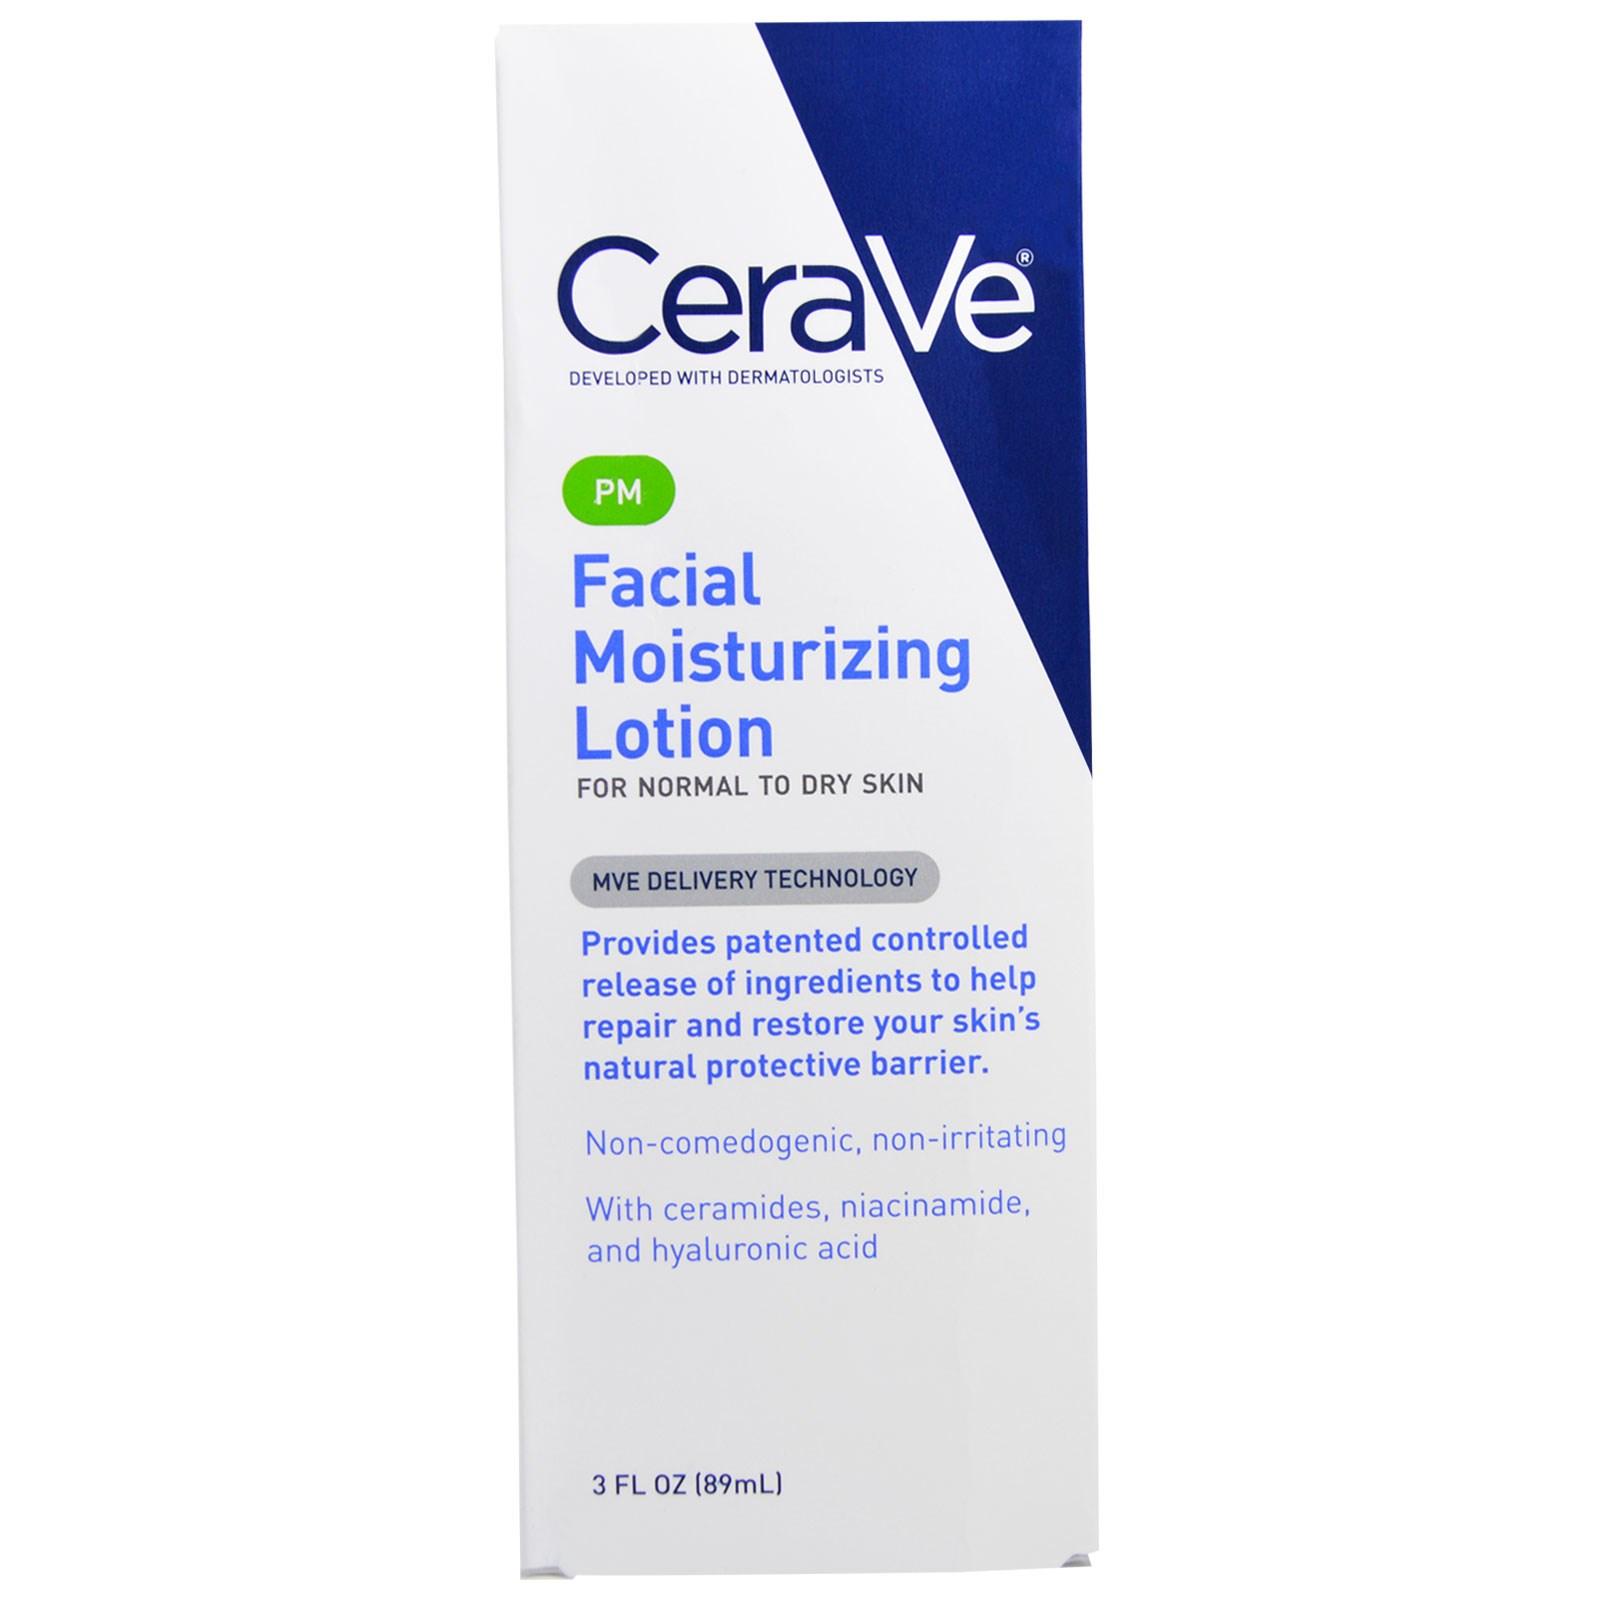 Увлажняющий лосьон для лица CeraVe, PM (89 мл)